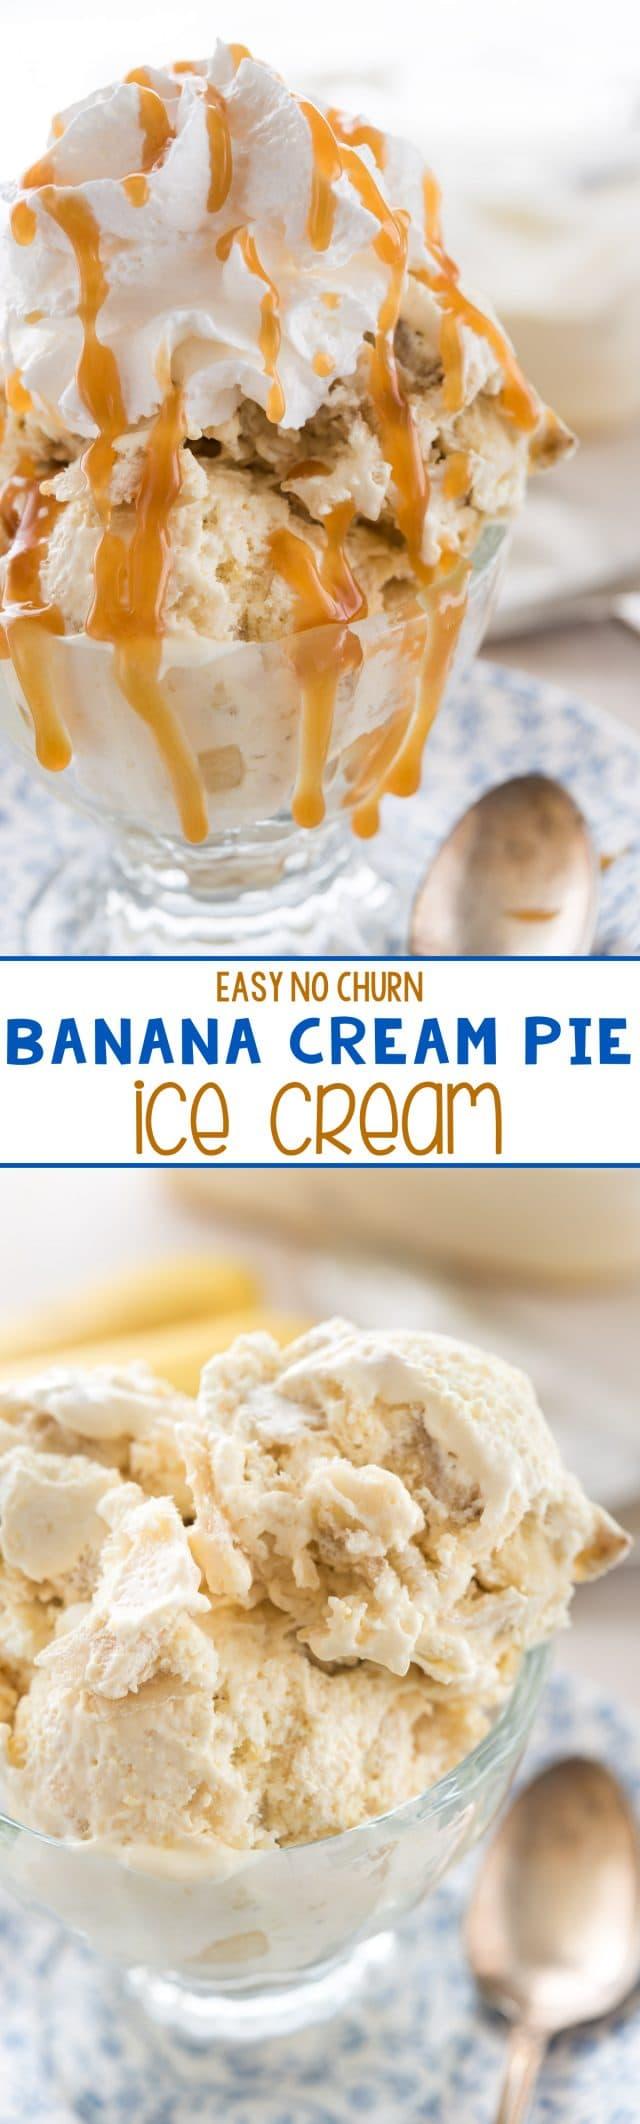 Easy Banana Cream Pie Ice Cream - this No Churn Ice Cream Recipe tastes just like a DQ Blizzard!